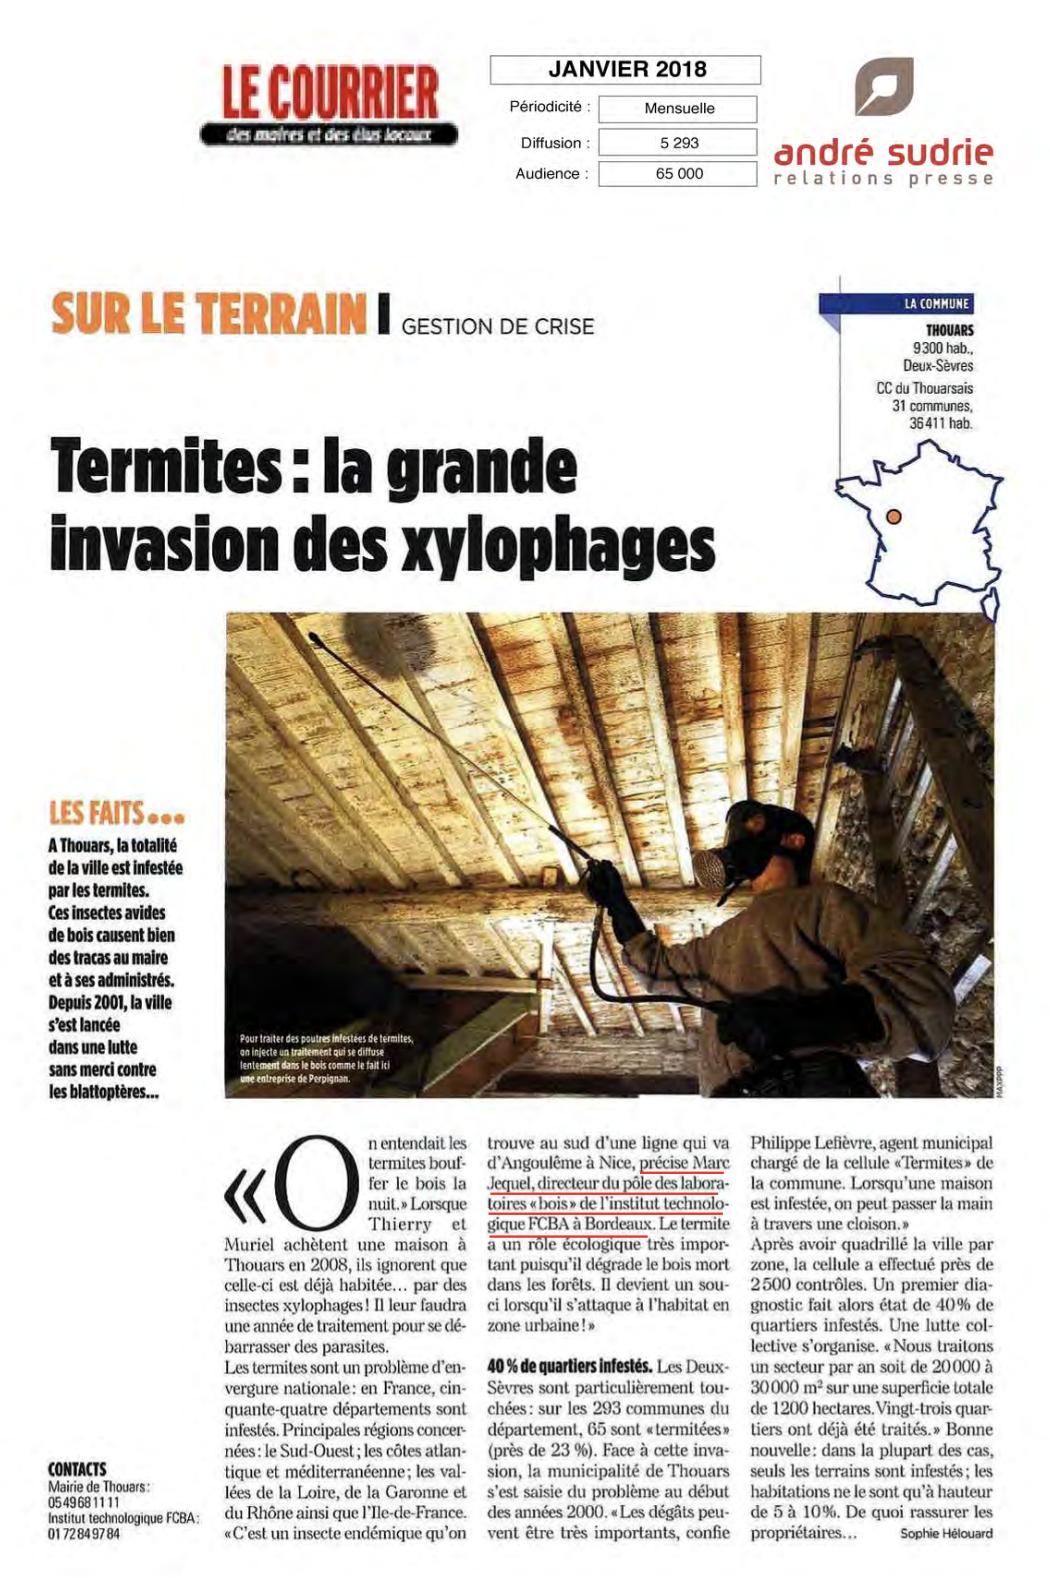 Termites la grande invasion des xylophages